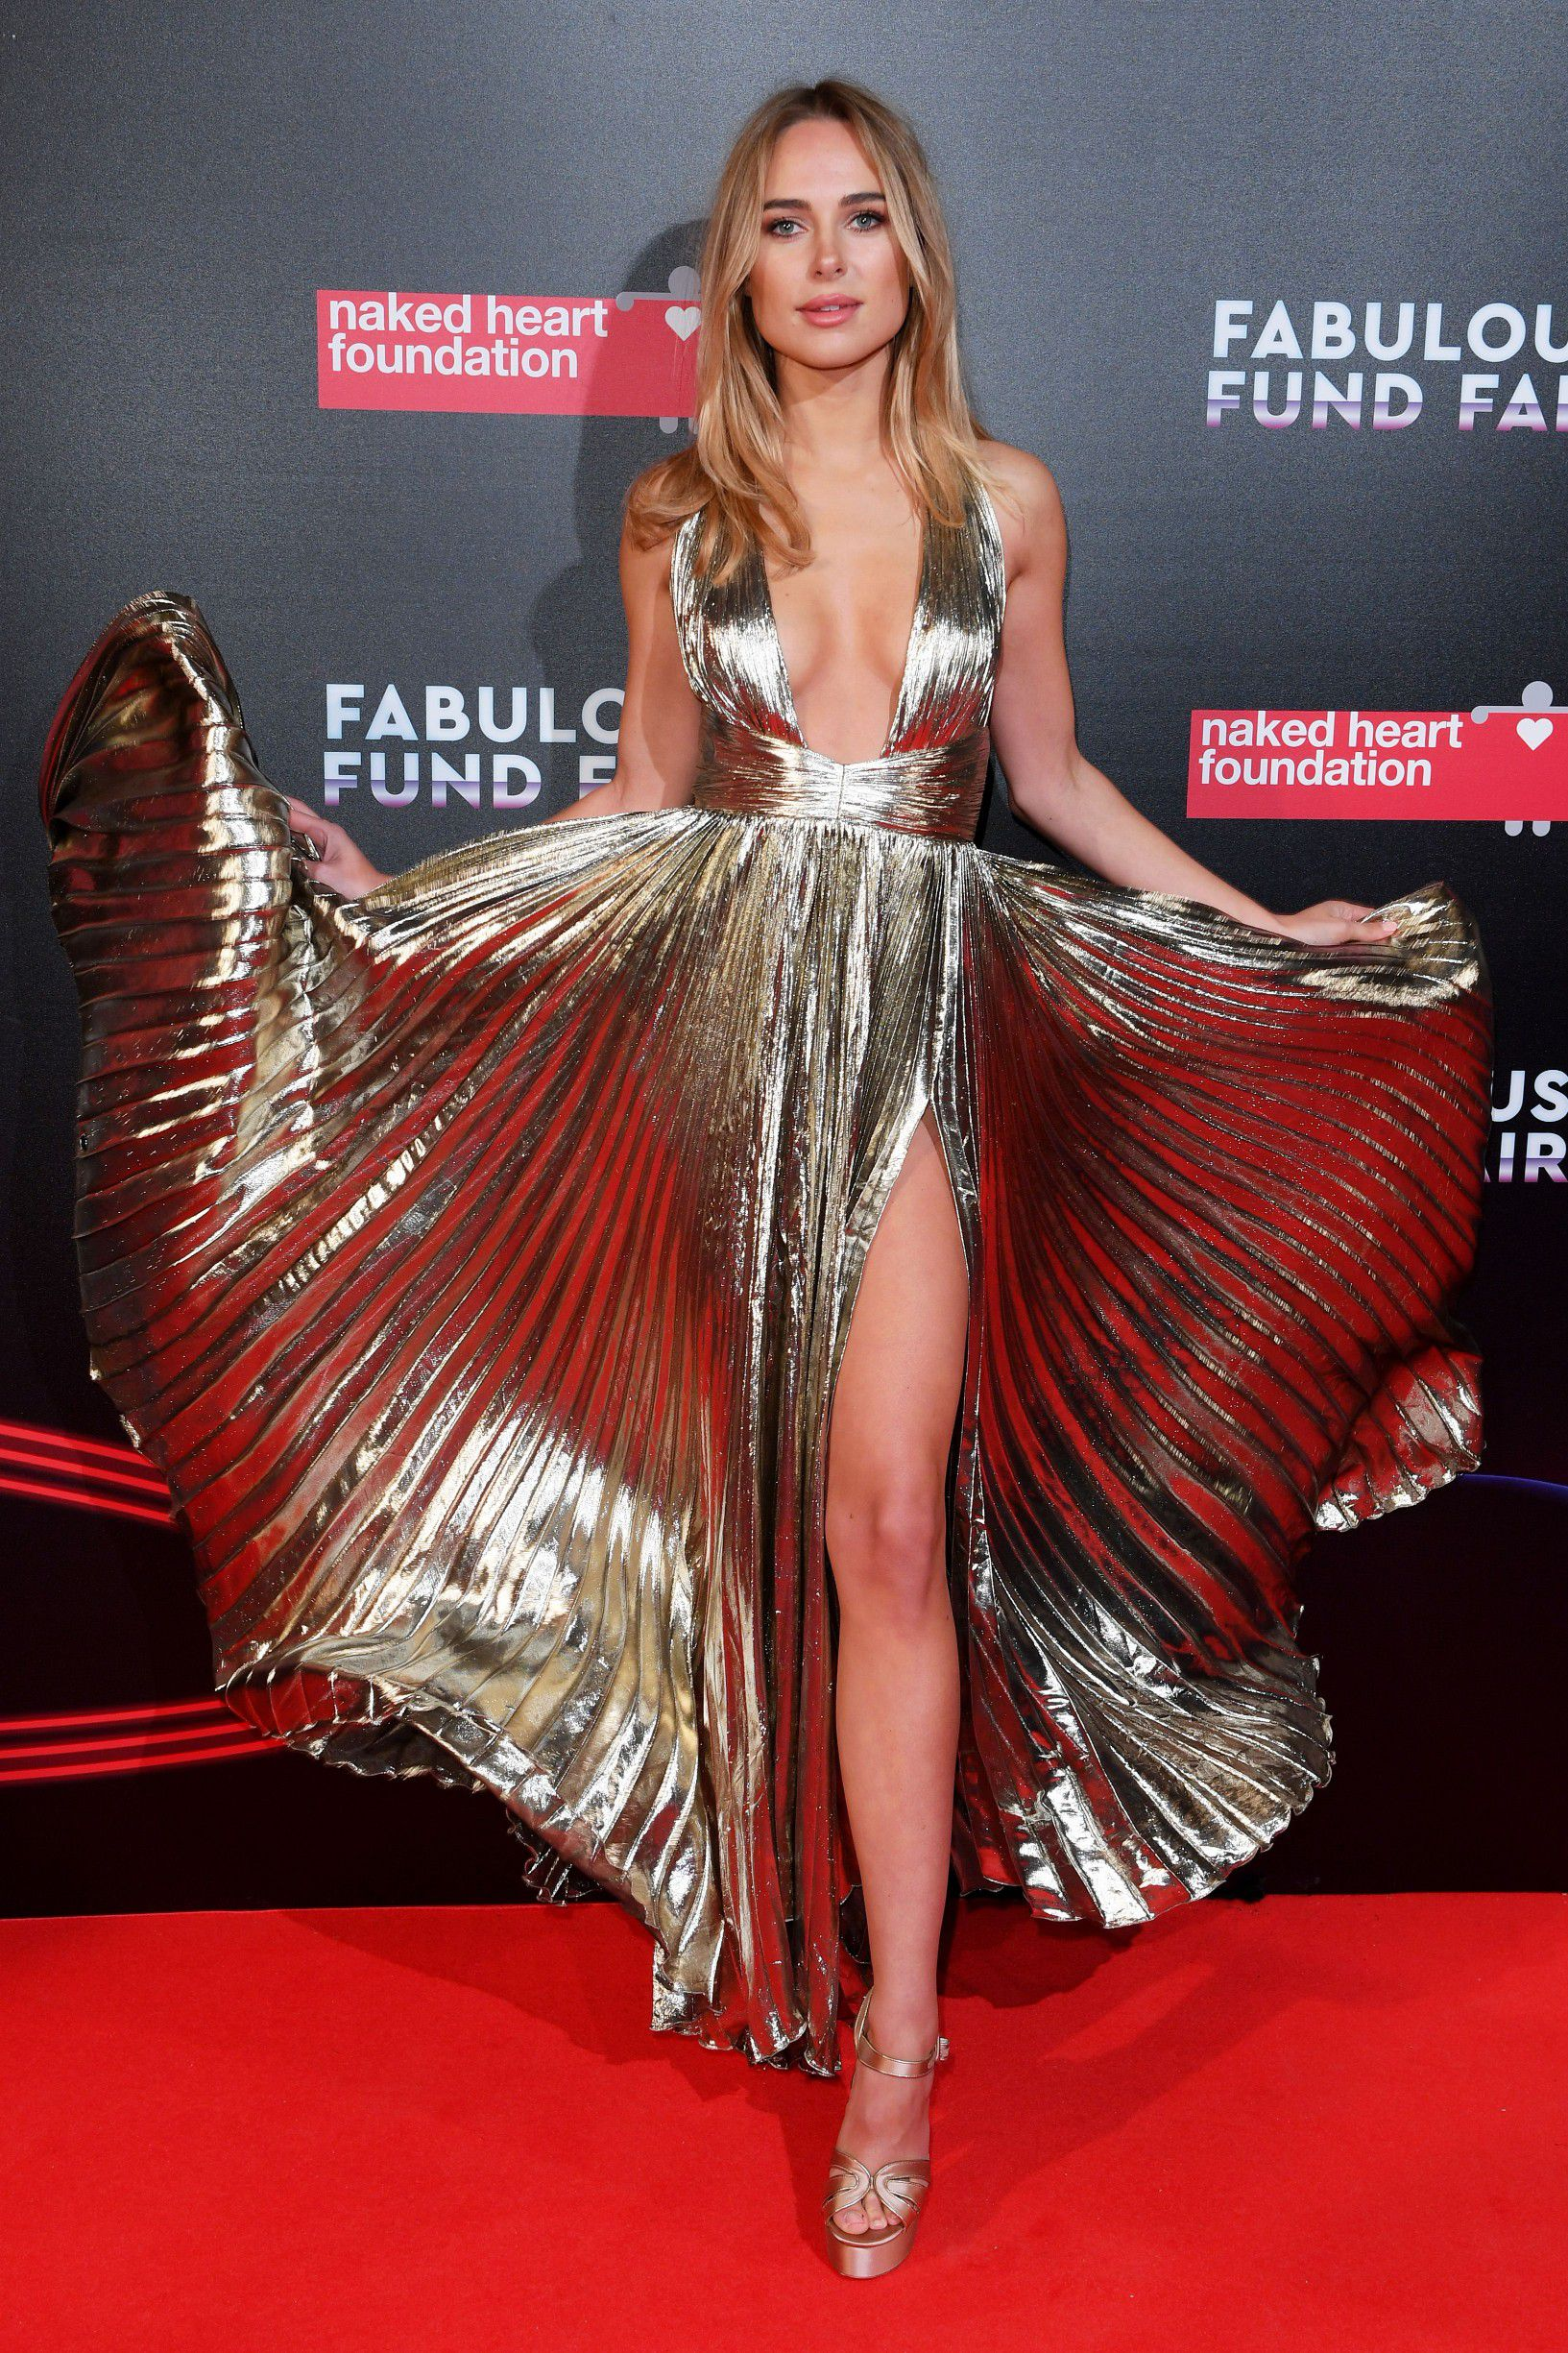 kimberley-garner-cleavage-at-fabulous-fund-fair-in-london-4677